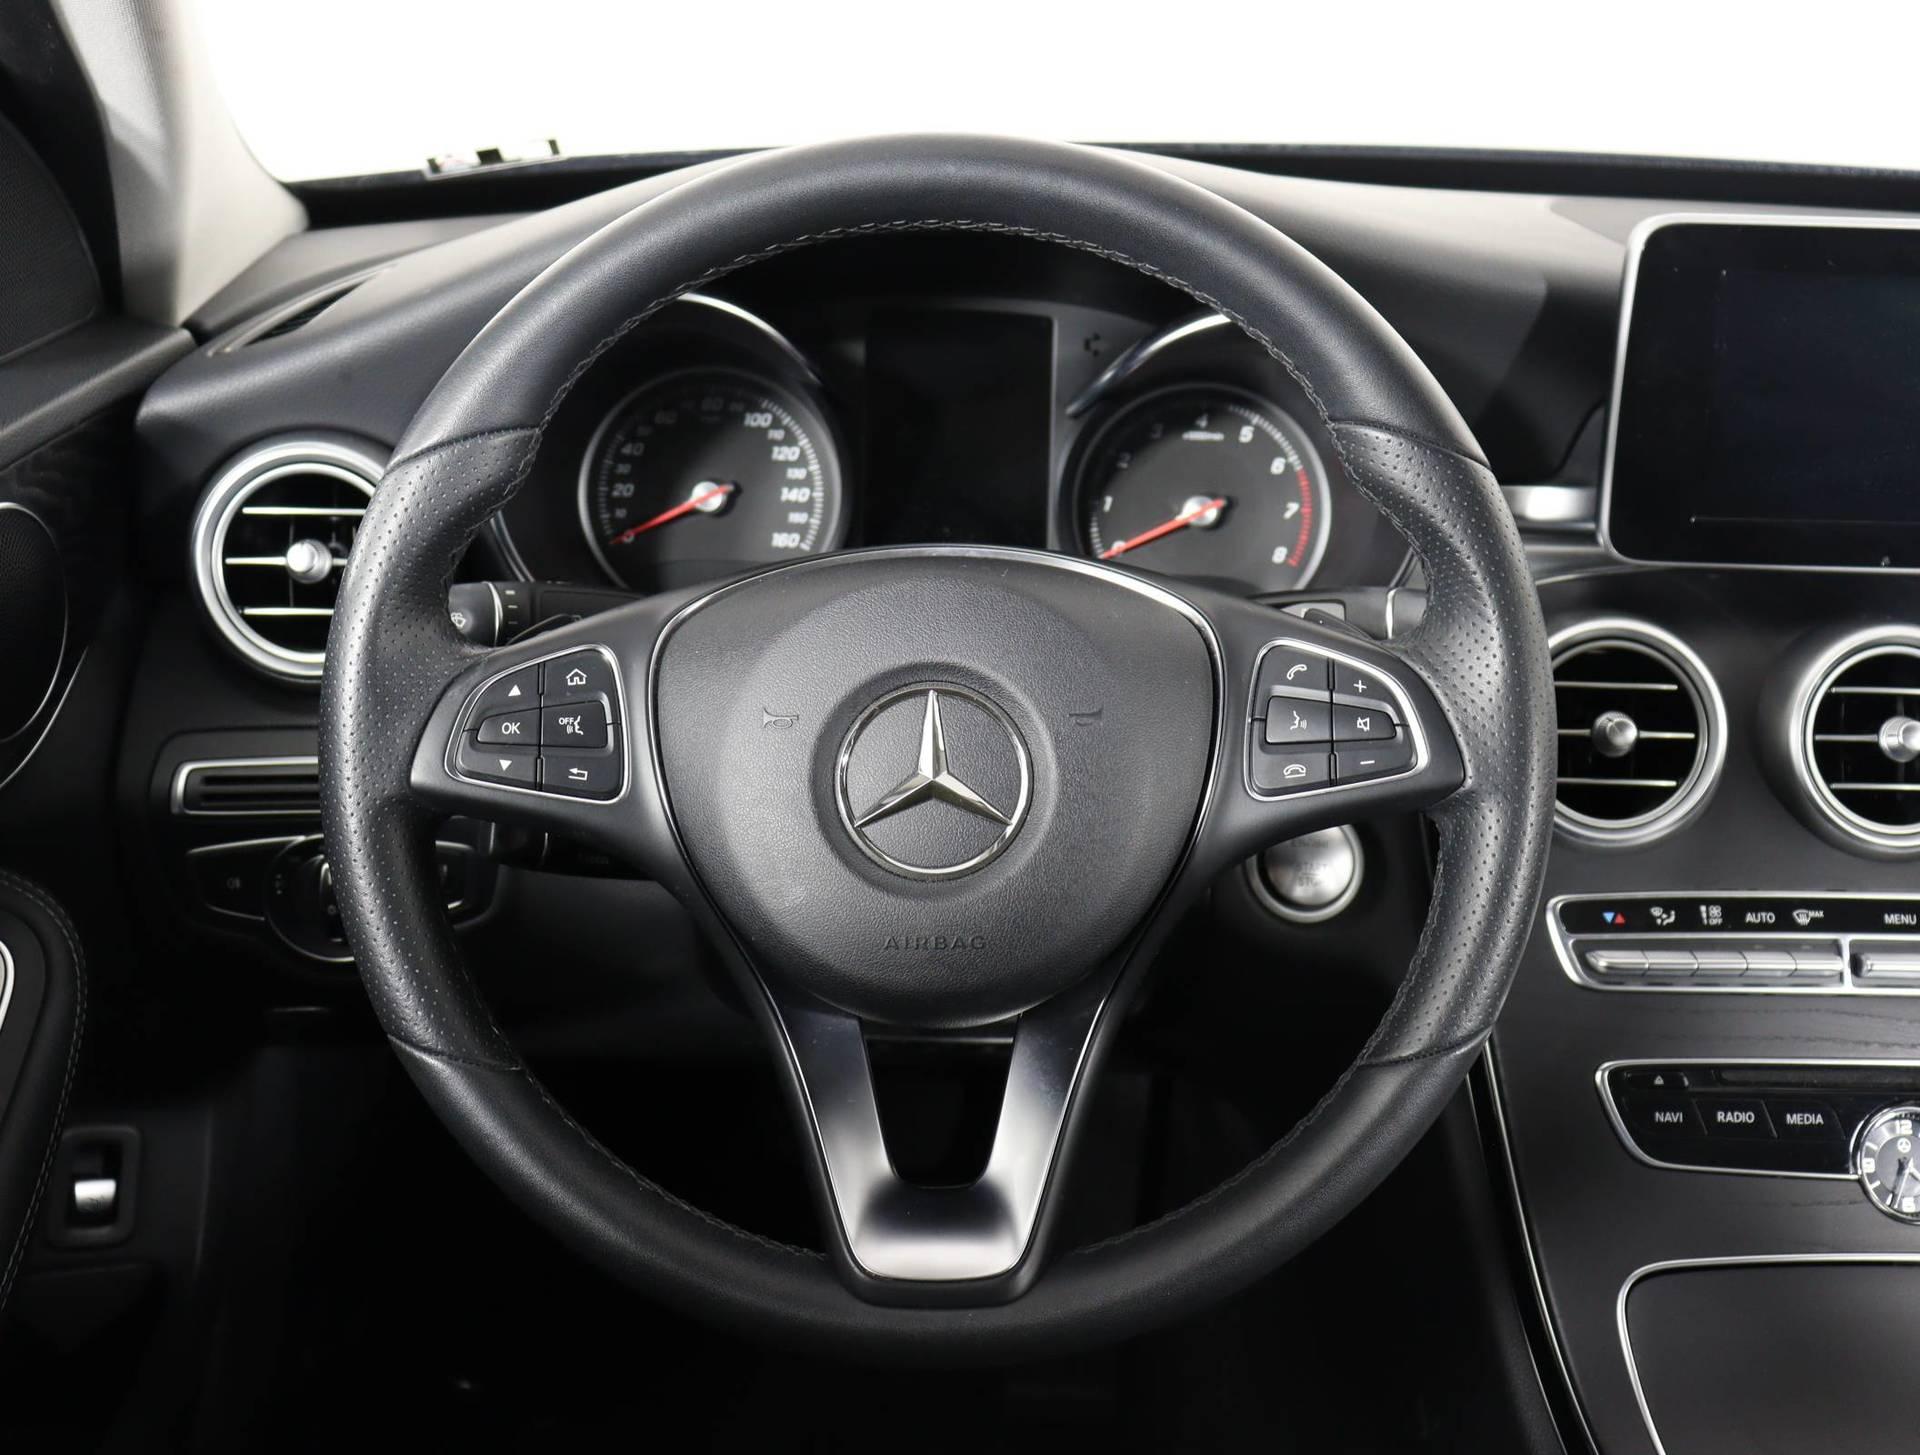 used vehicle - Sedan MERCEDES-BENZ C-CLASS 2017